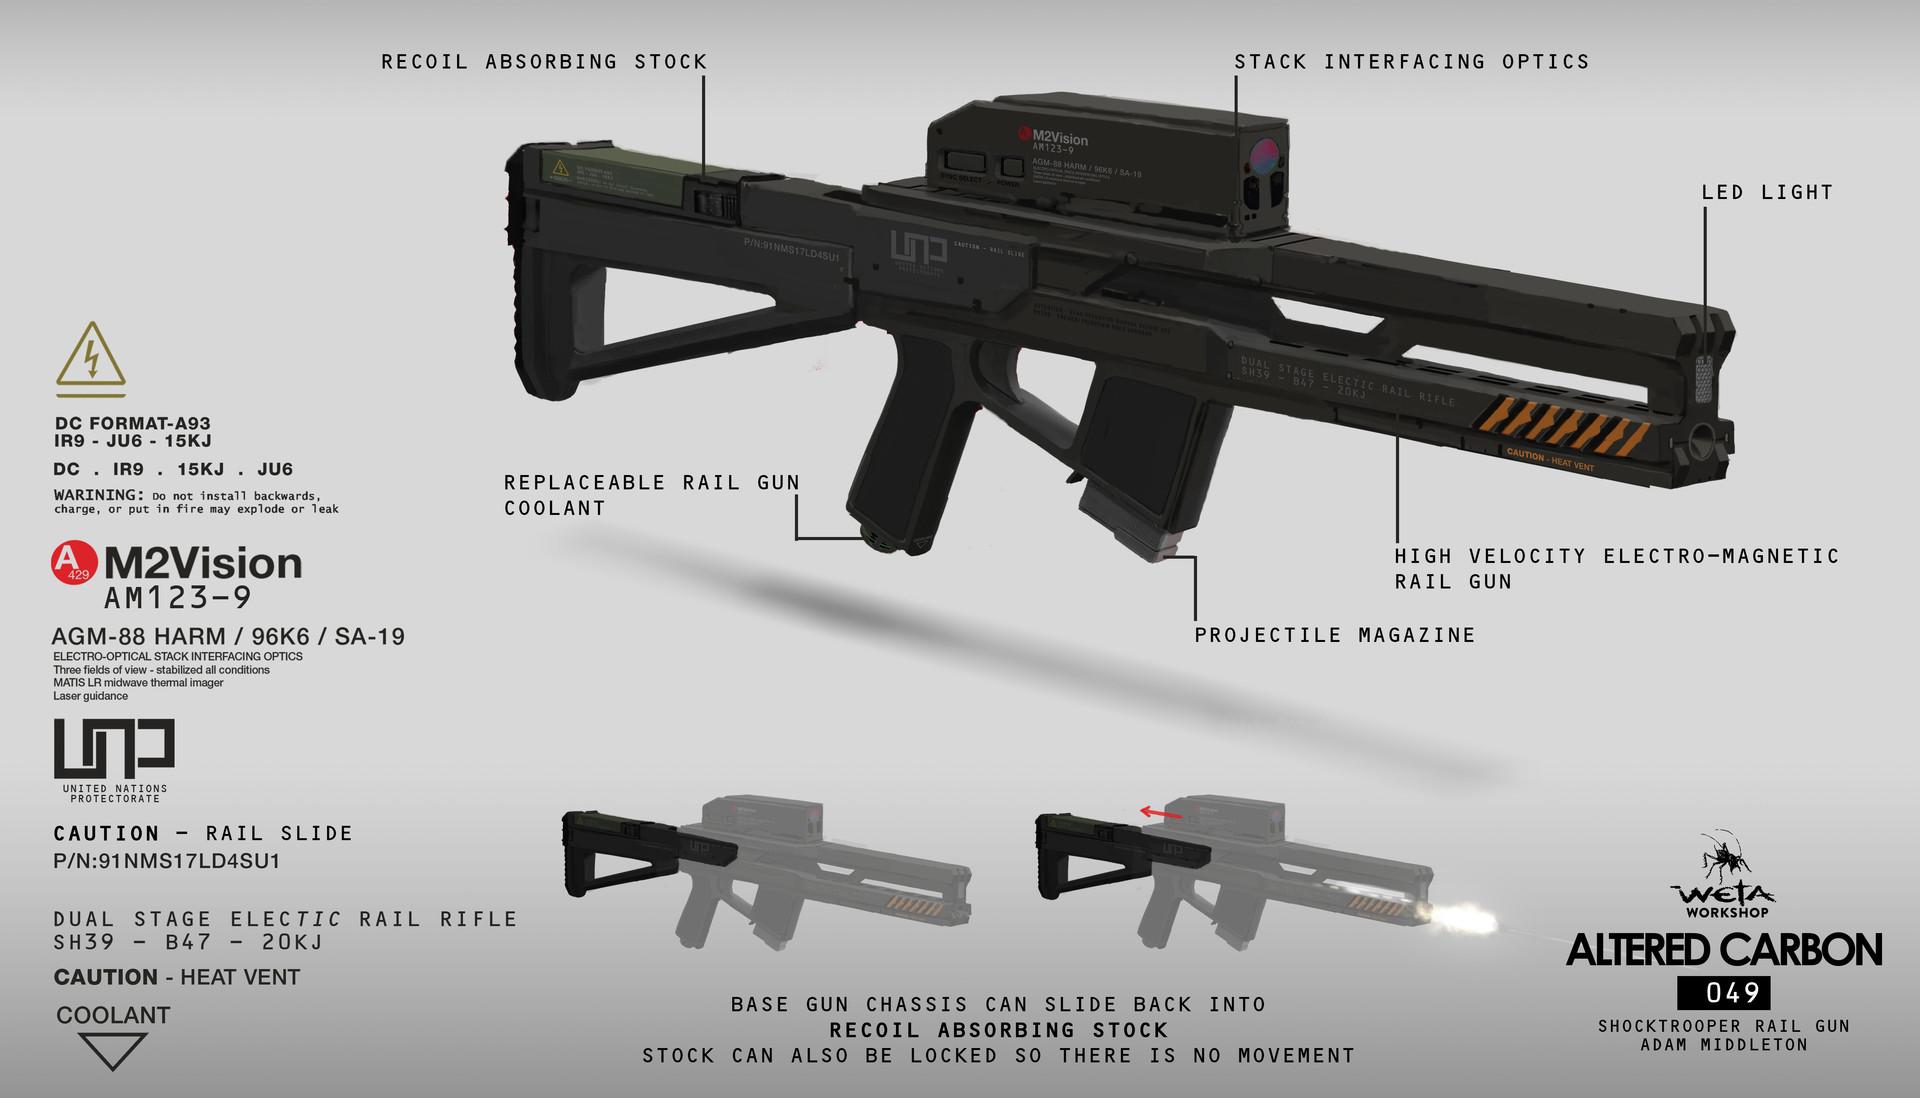 Adam middleton 049 ac shocktrooter railgun 01 breakdown am